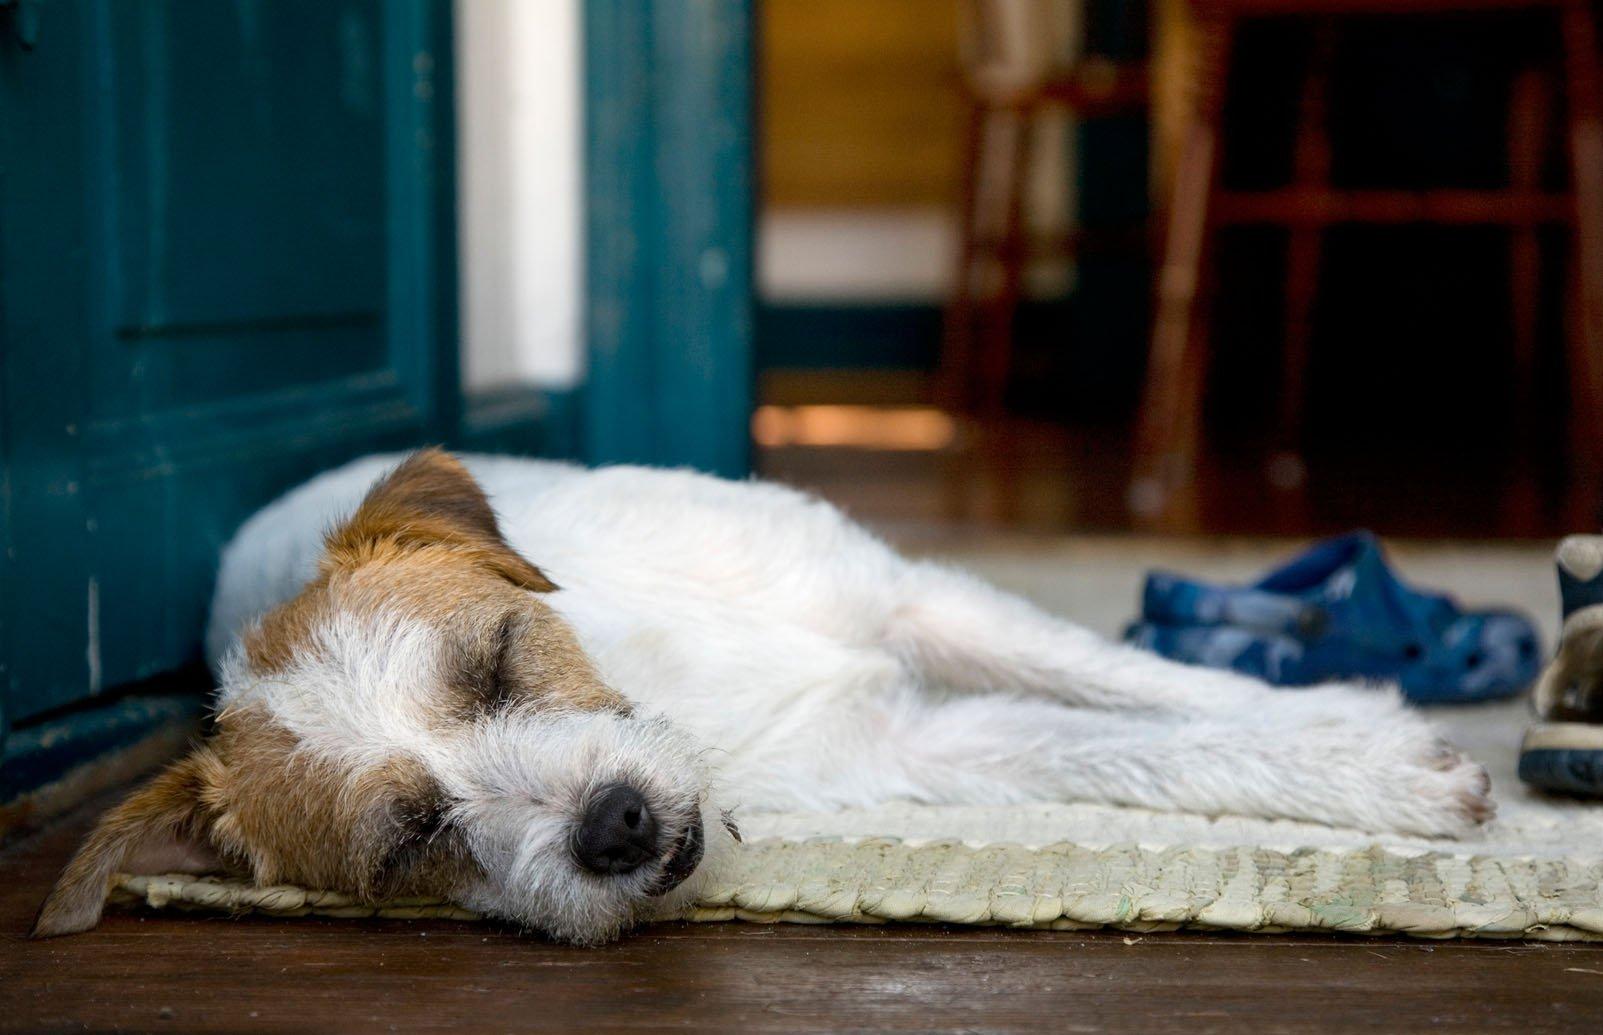 A dog sleeping on a rug